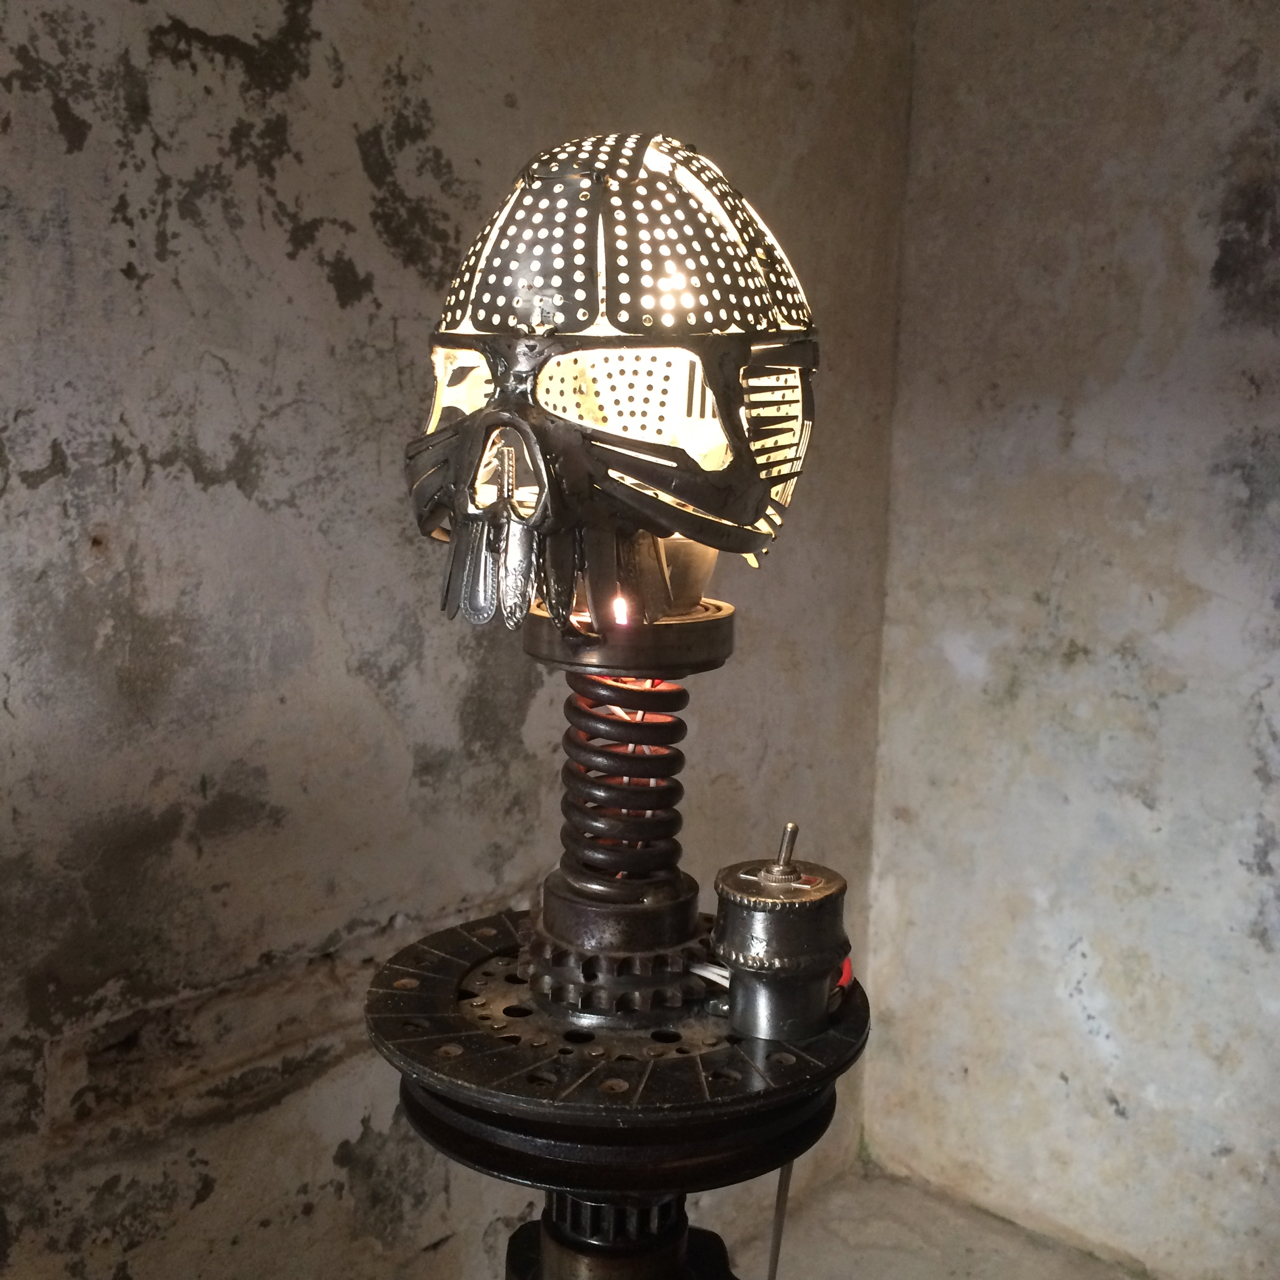 Sculpture_in_the_Gaol_2018-Skull_Lamp-by-Sam_Hawkins.jpg